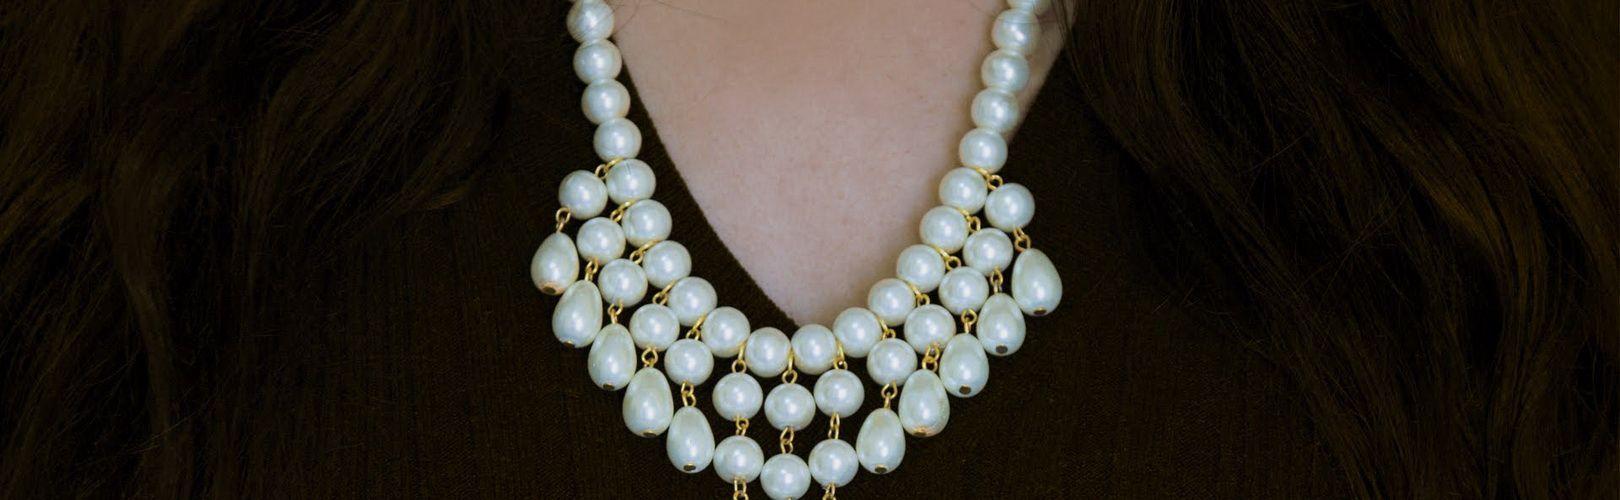 Ожерелье из жемчуга - символ женской элегантности